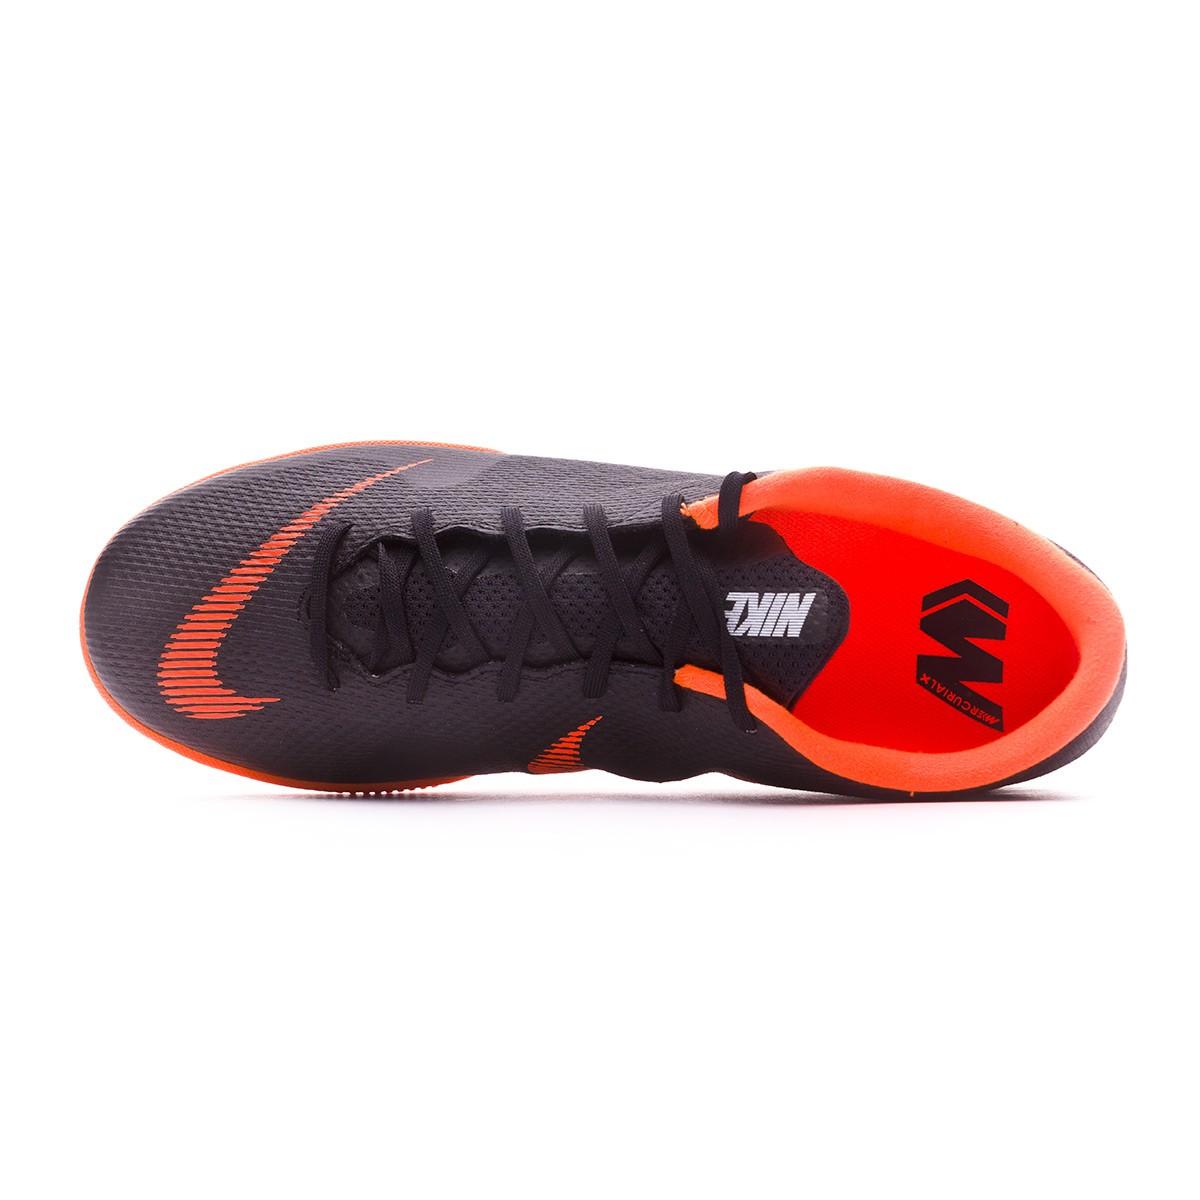 sports shoes 59740 683b9 Chaussure de futsal Nike Mercurial VaporX XII Academy IC Black-Total  orange-White - Boutique de football Fútbol Emotion